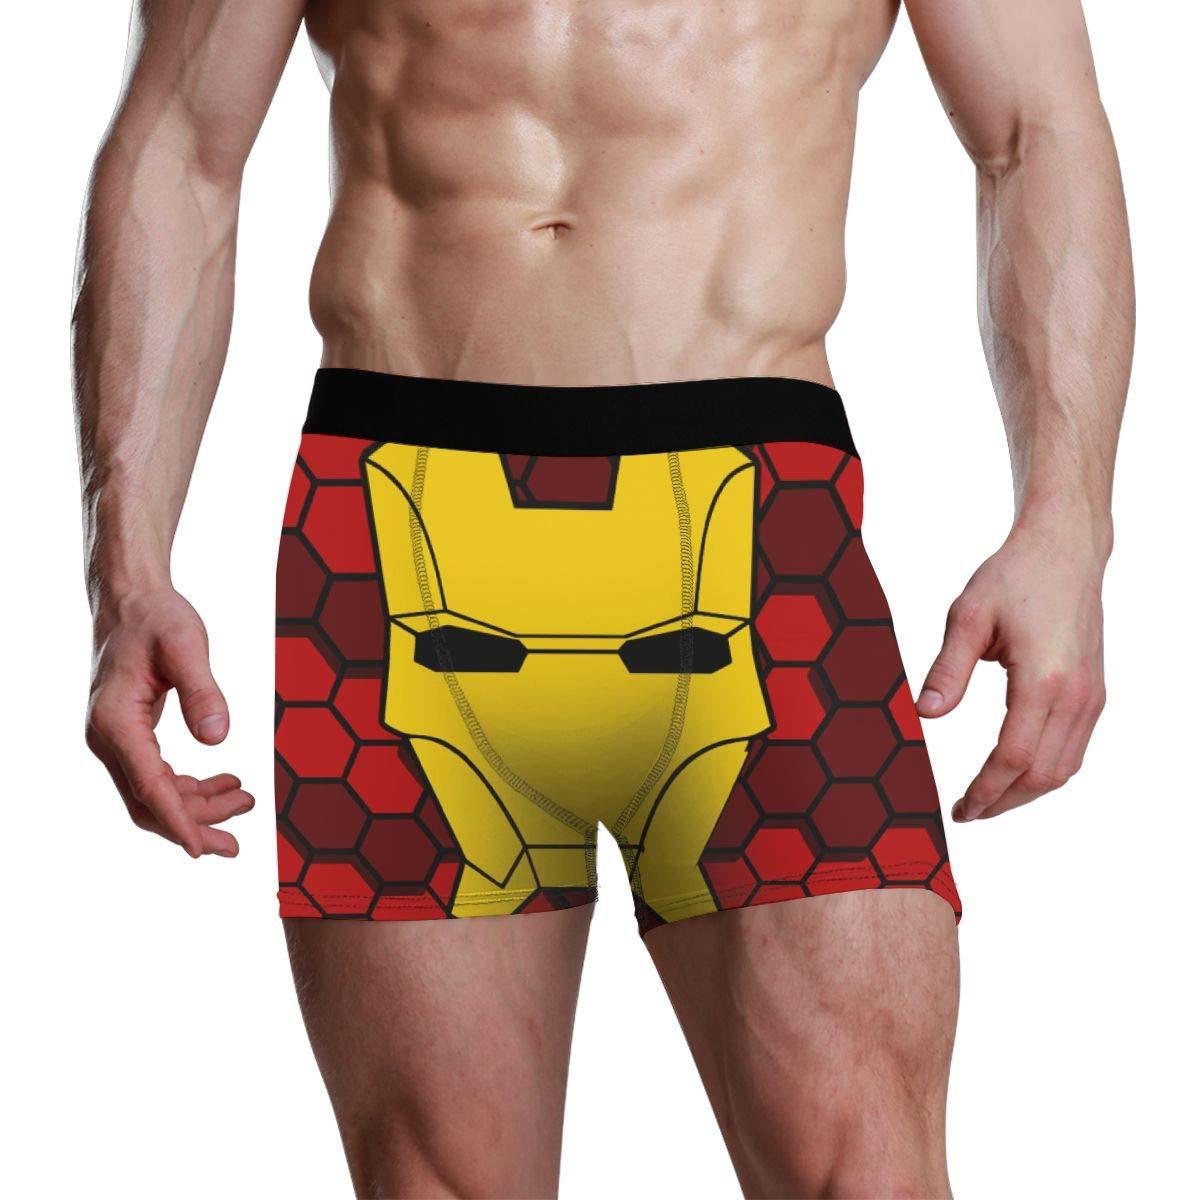 Iron Man Boxer Briefs Mens Underwear Pack Seamless Comfort Soft